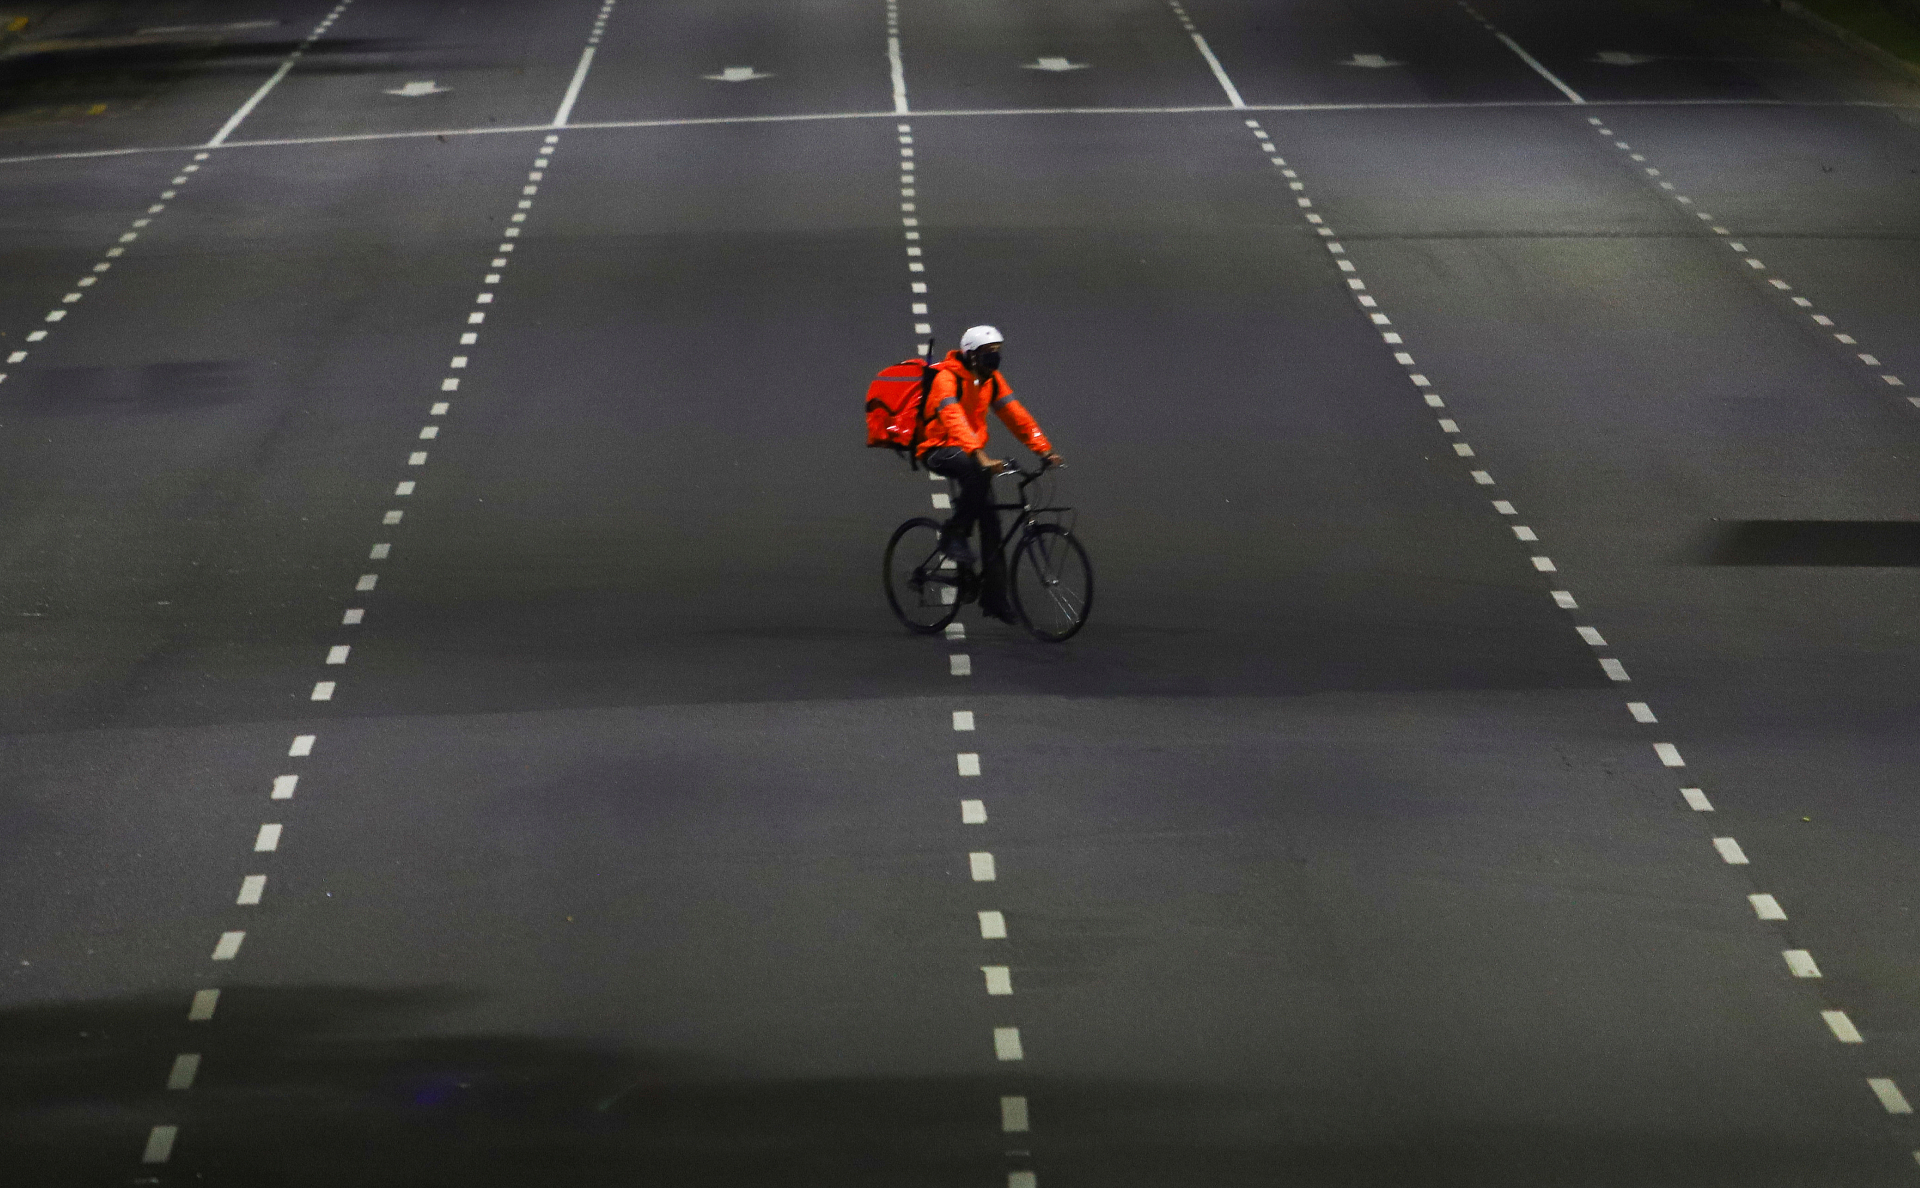 Фото: Matias Baglietto / Reuters